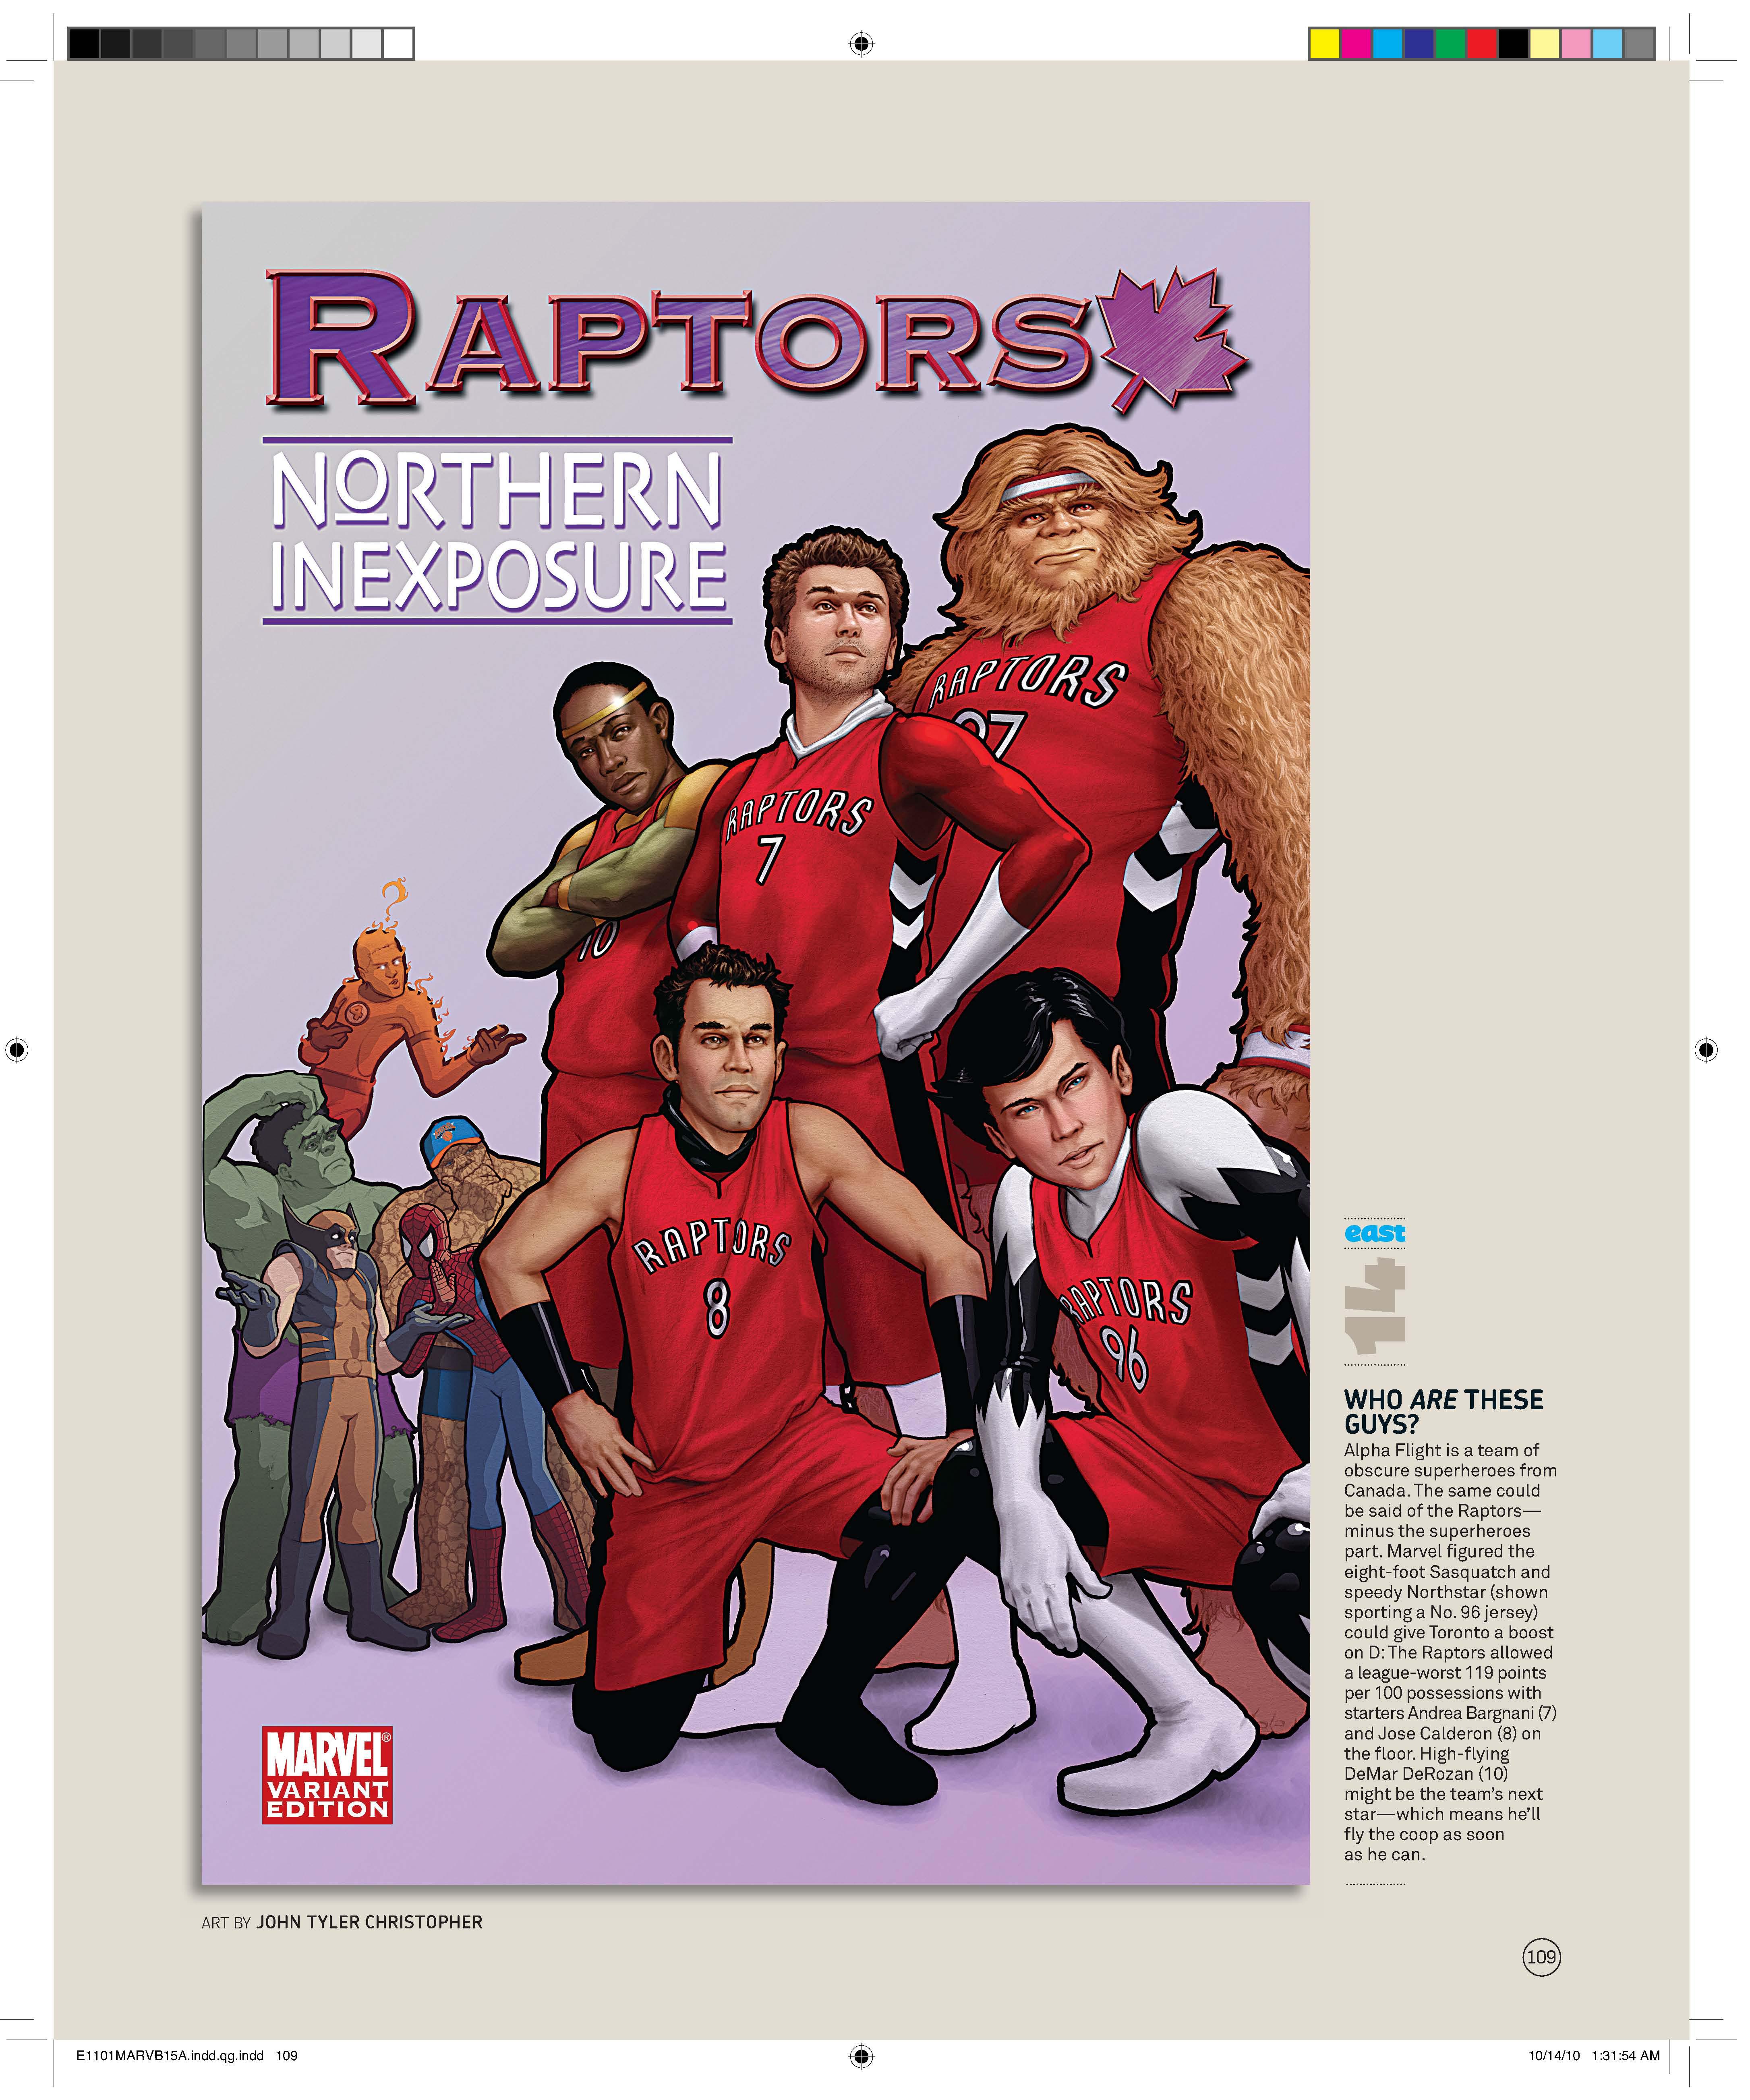 Espn & marvel's nba comic covers ballislife. Com.